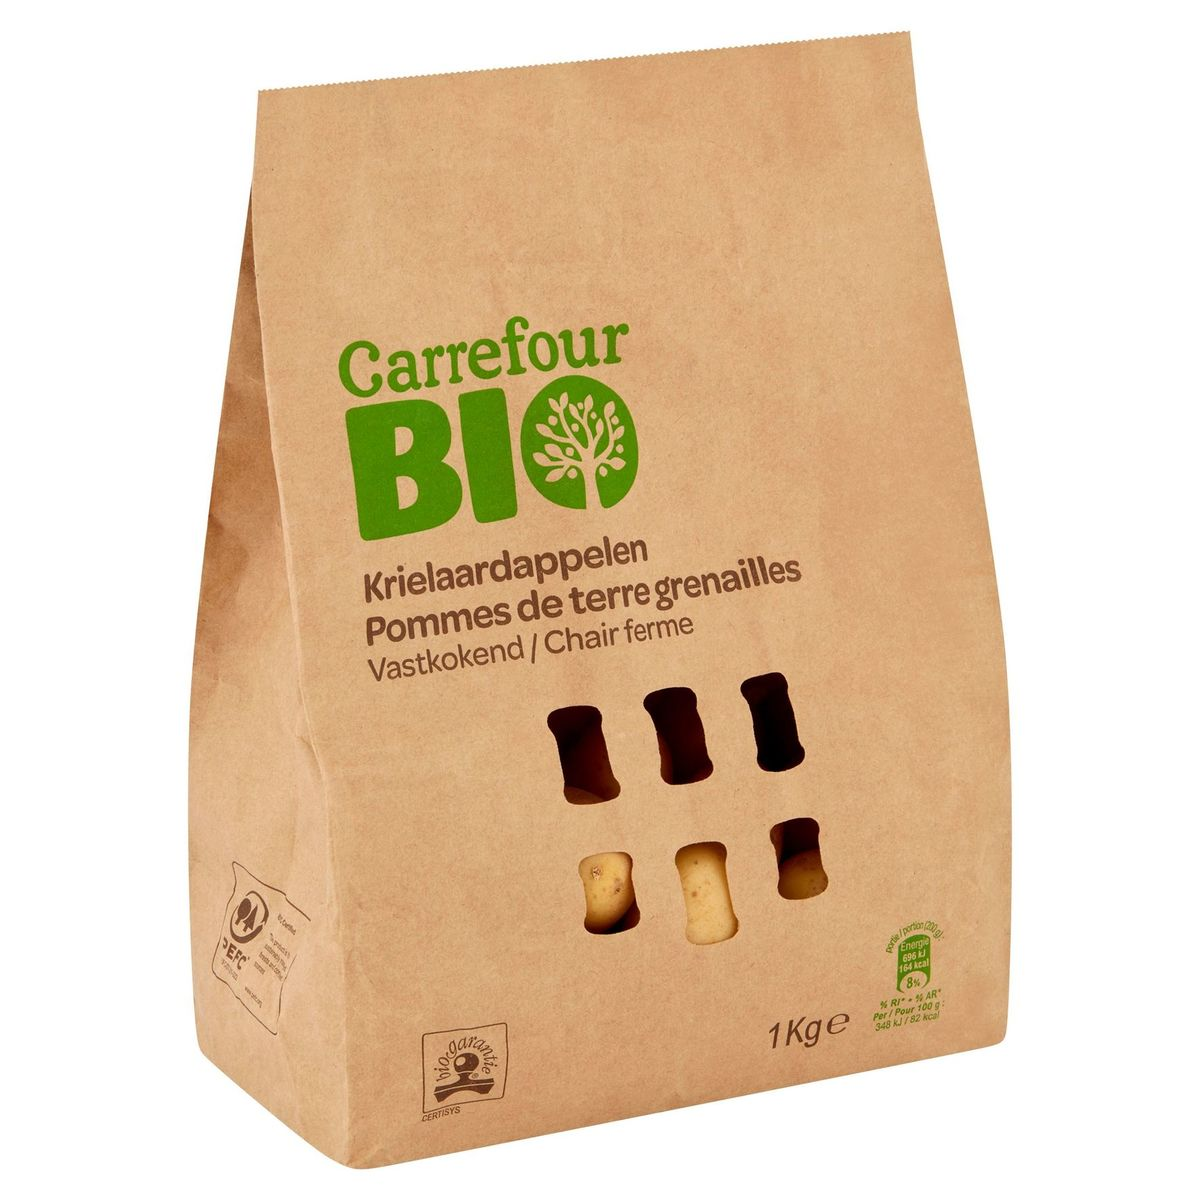 Carrefour Bio Krielaardappelen Vastkokend 1 kg